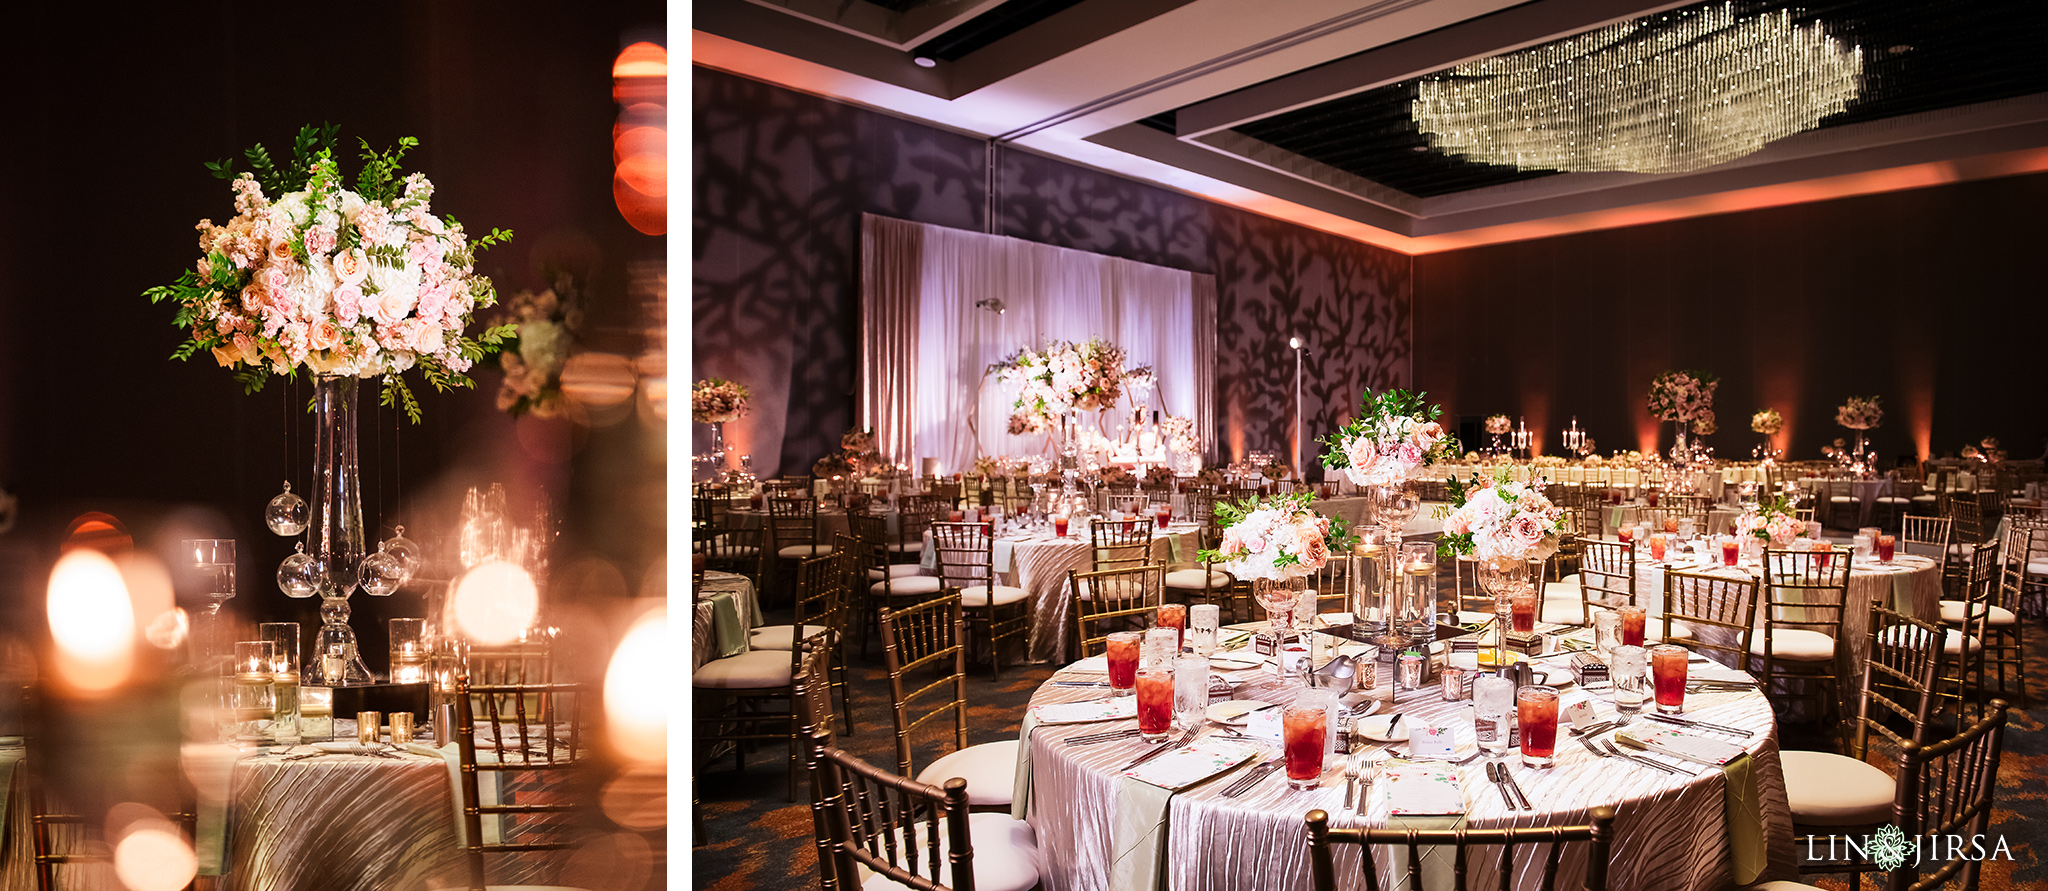 0023 Marriott Hotel San Diego Wedding Photography